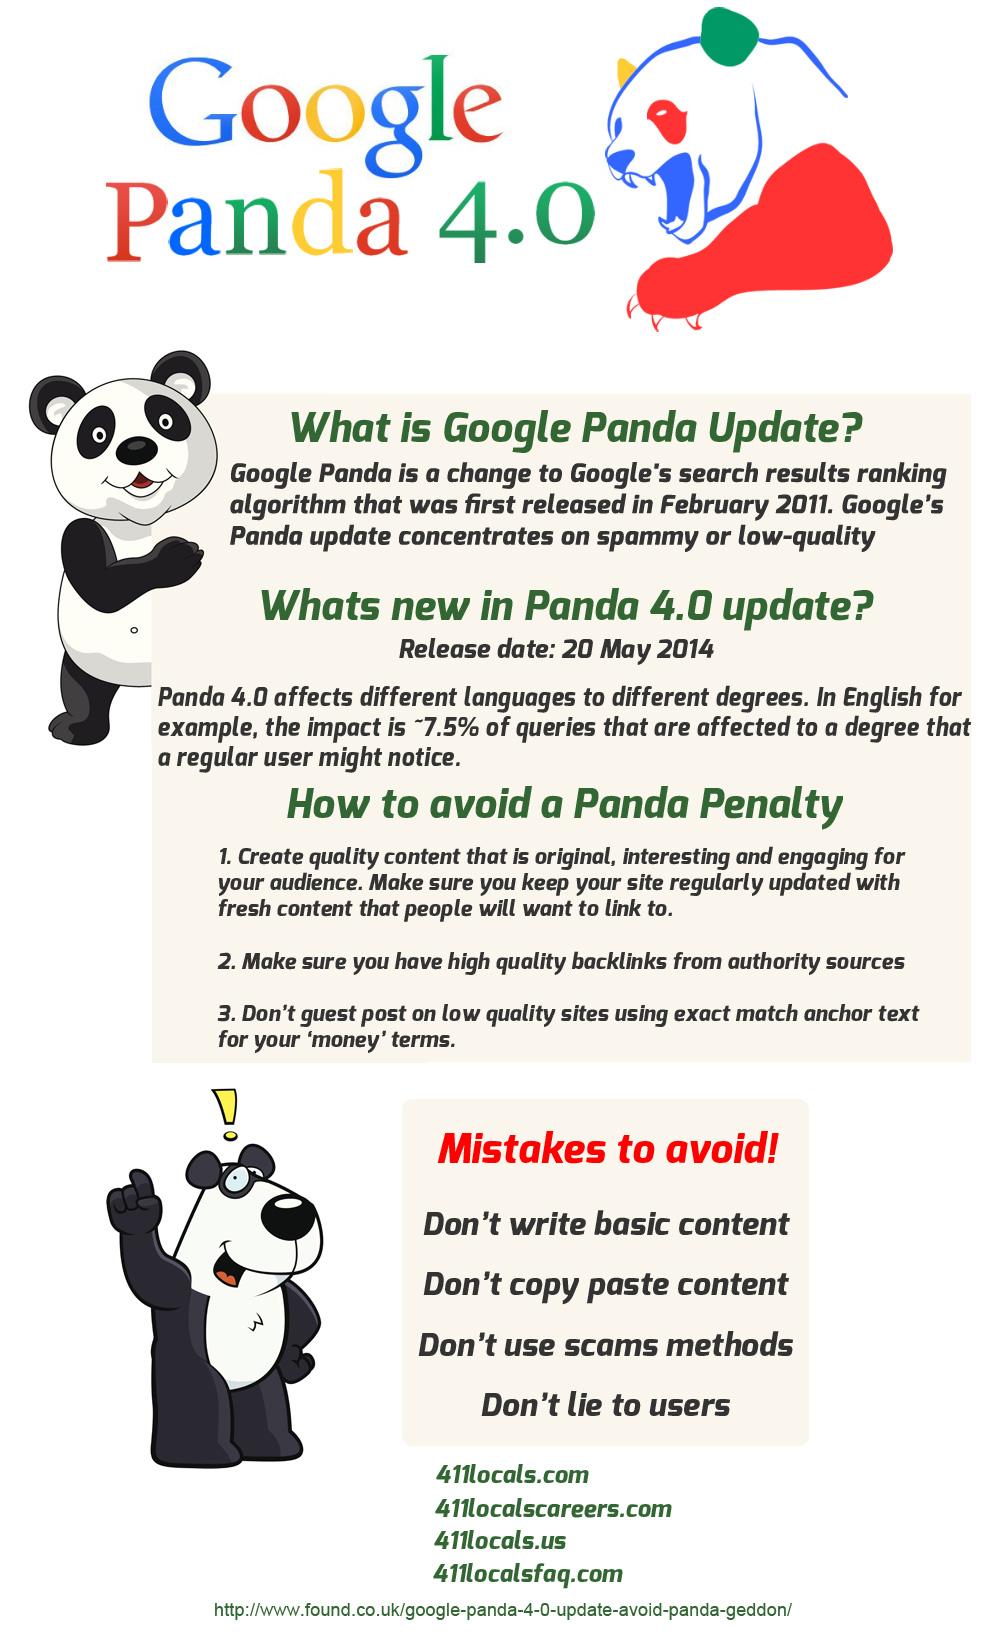 google_panda_4.0_infographic_411locals